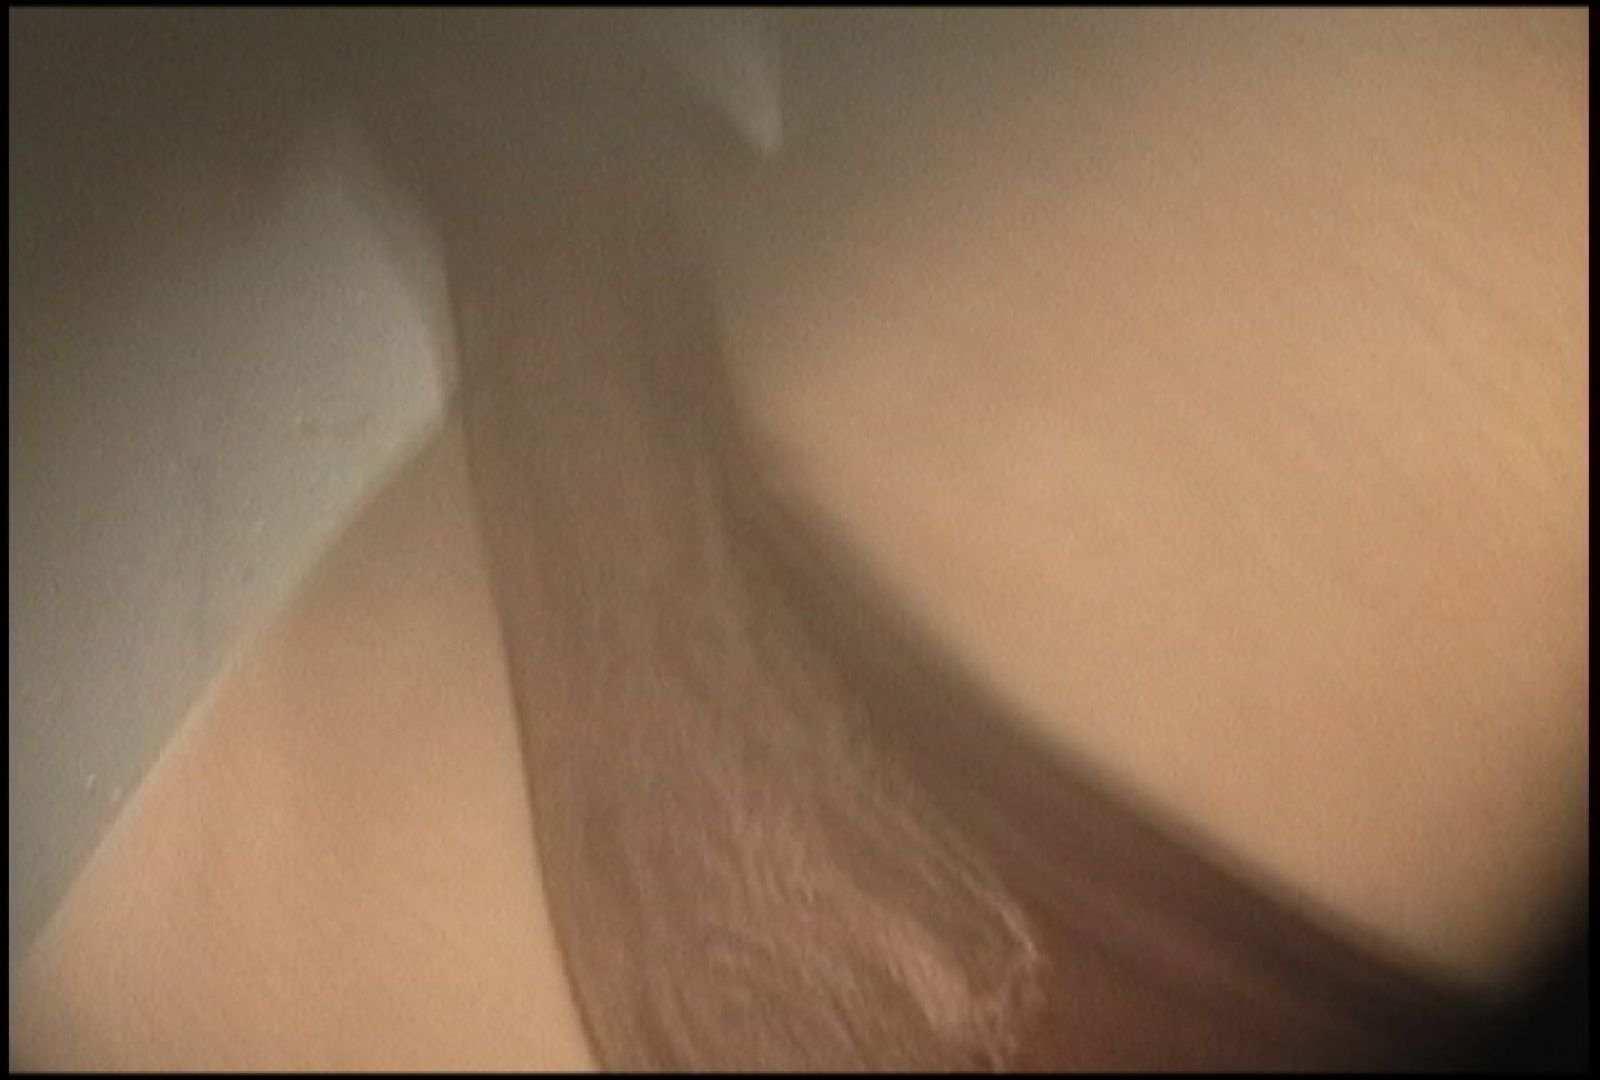 No.142 肥大しても上向く乳首 健康的美女 乳首 覗きぱこり動画紹介 54pic 53